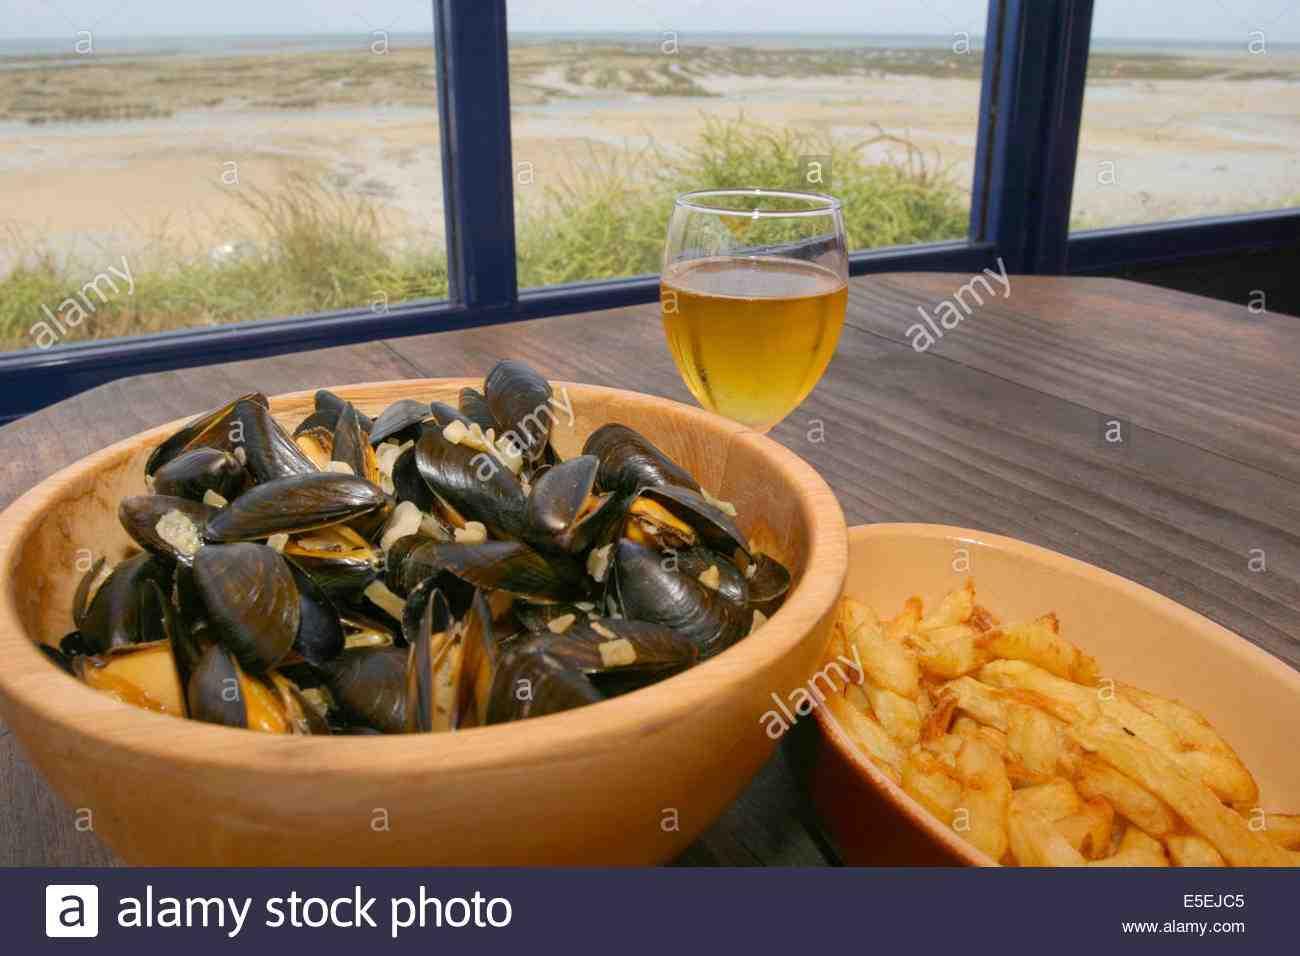 Où manger des massels et des frites à Honfleur?